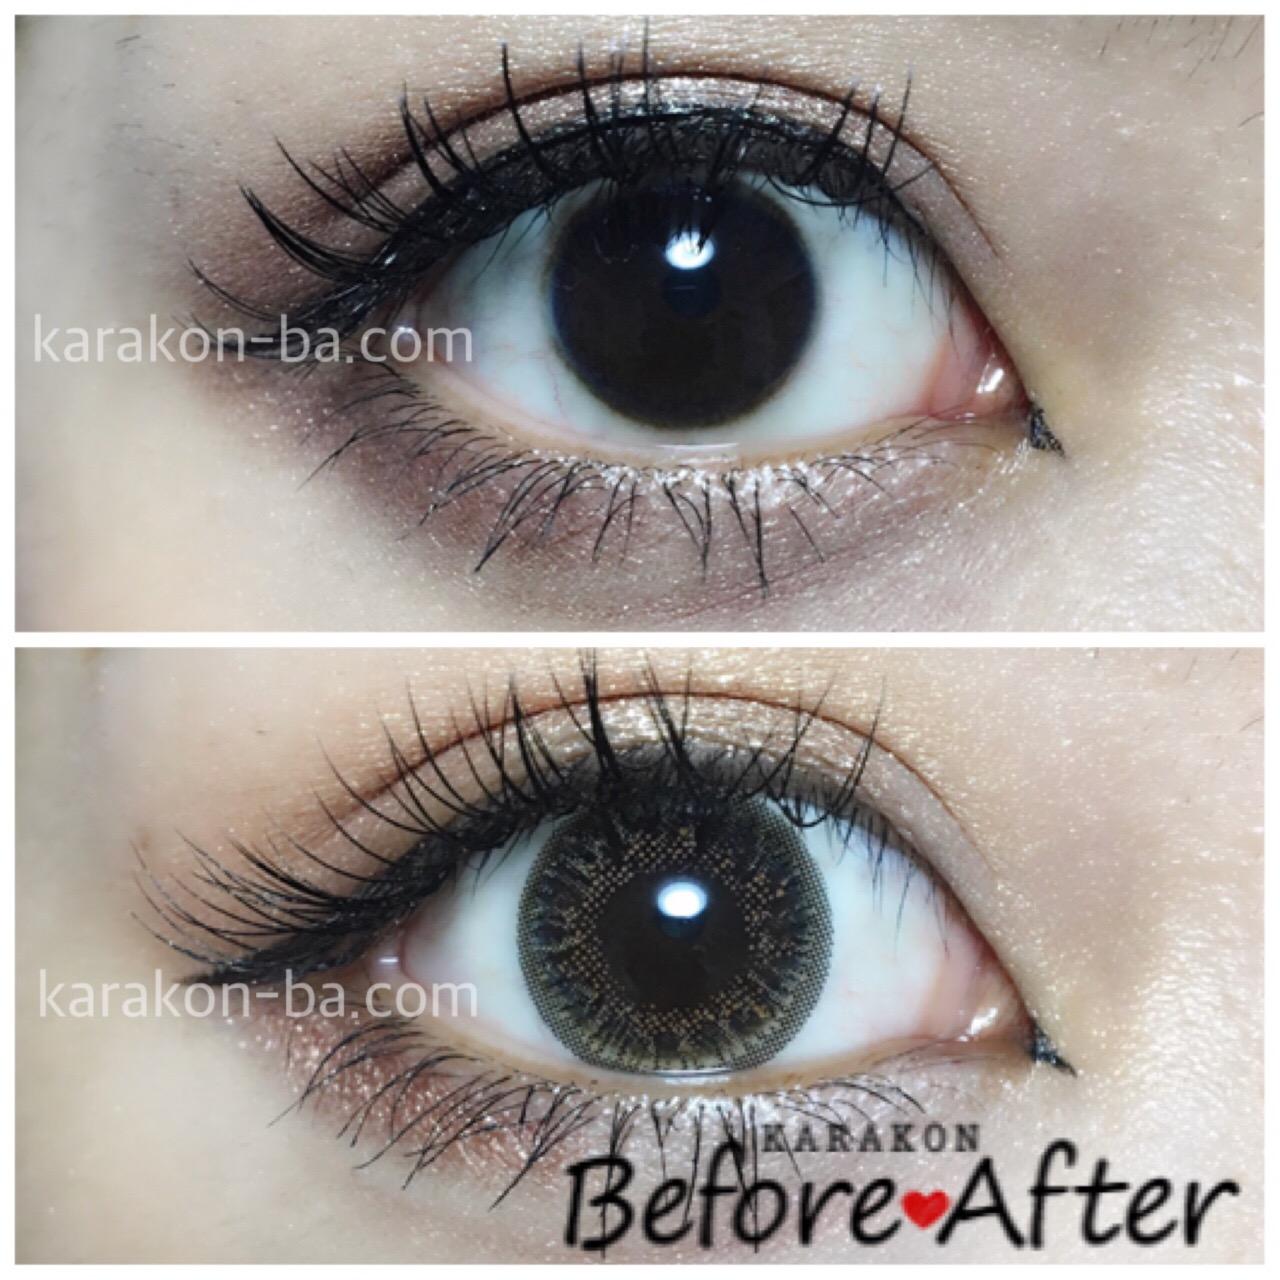 eyelist(アイリスト)シャインのカラコン装着画像/裸眼と比較レポ